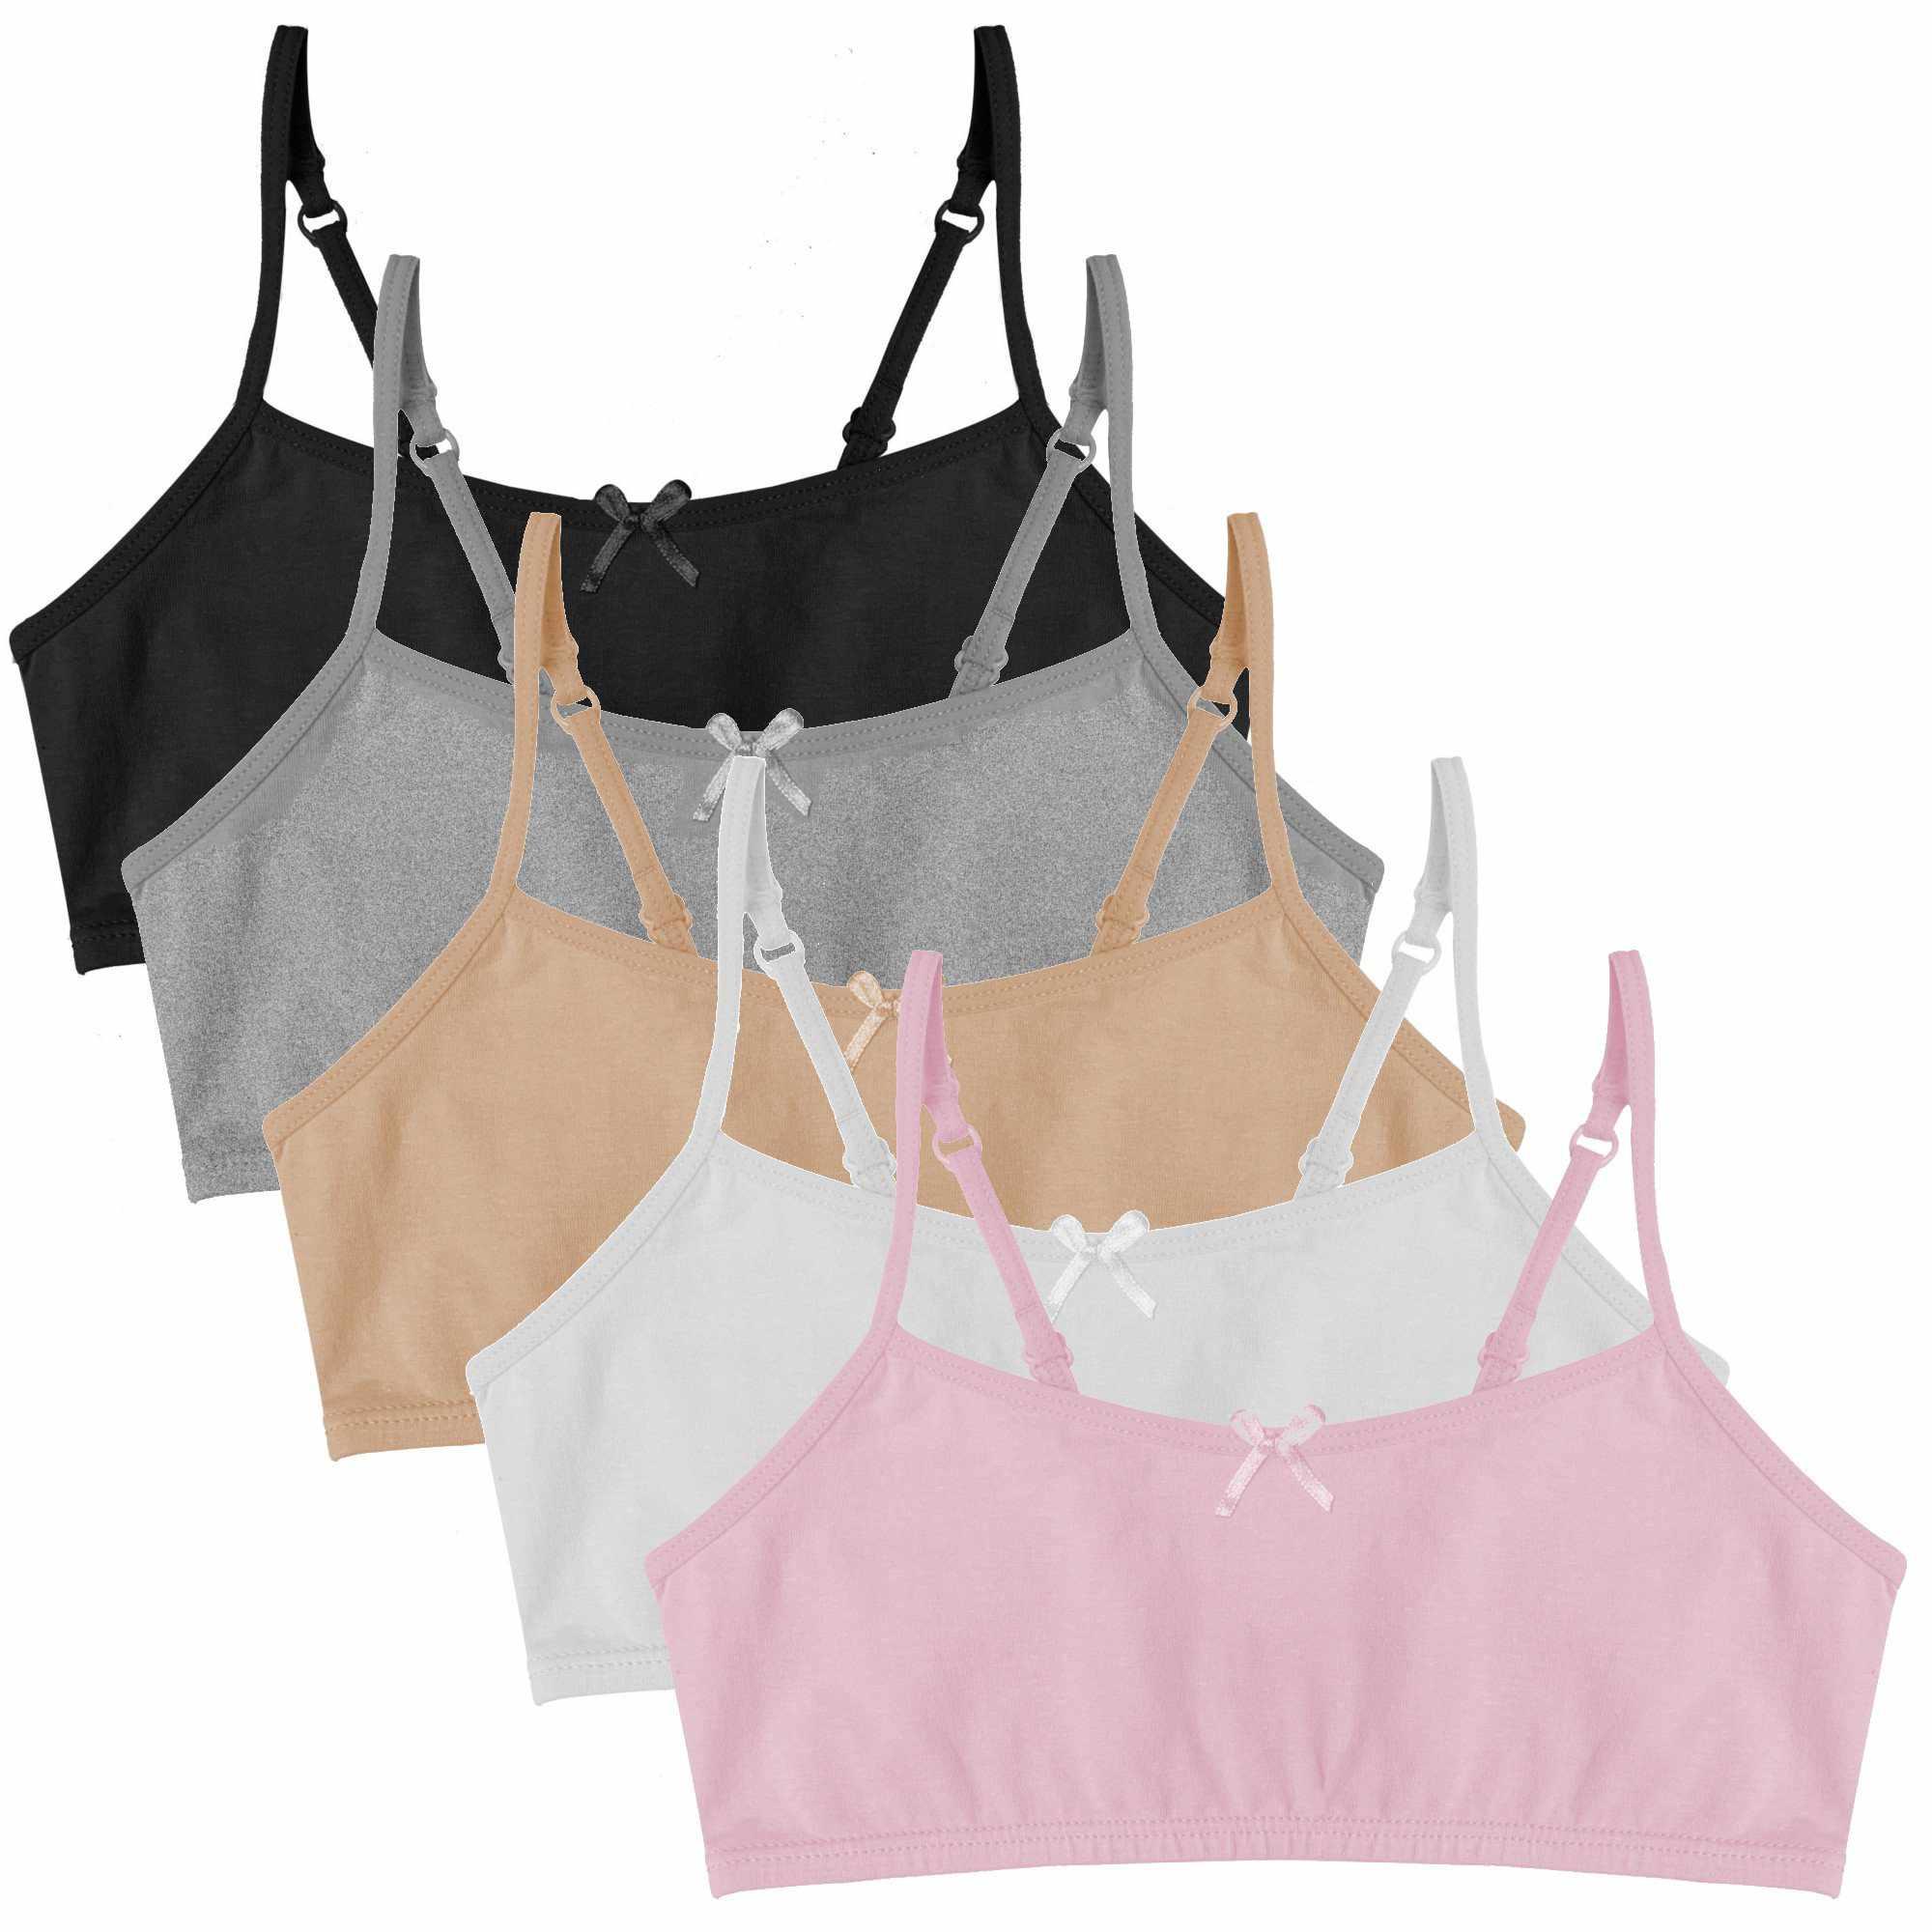 Popular Girls Cotton Crop Bra with Adjustable Straps 5-Pack